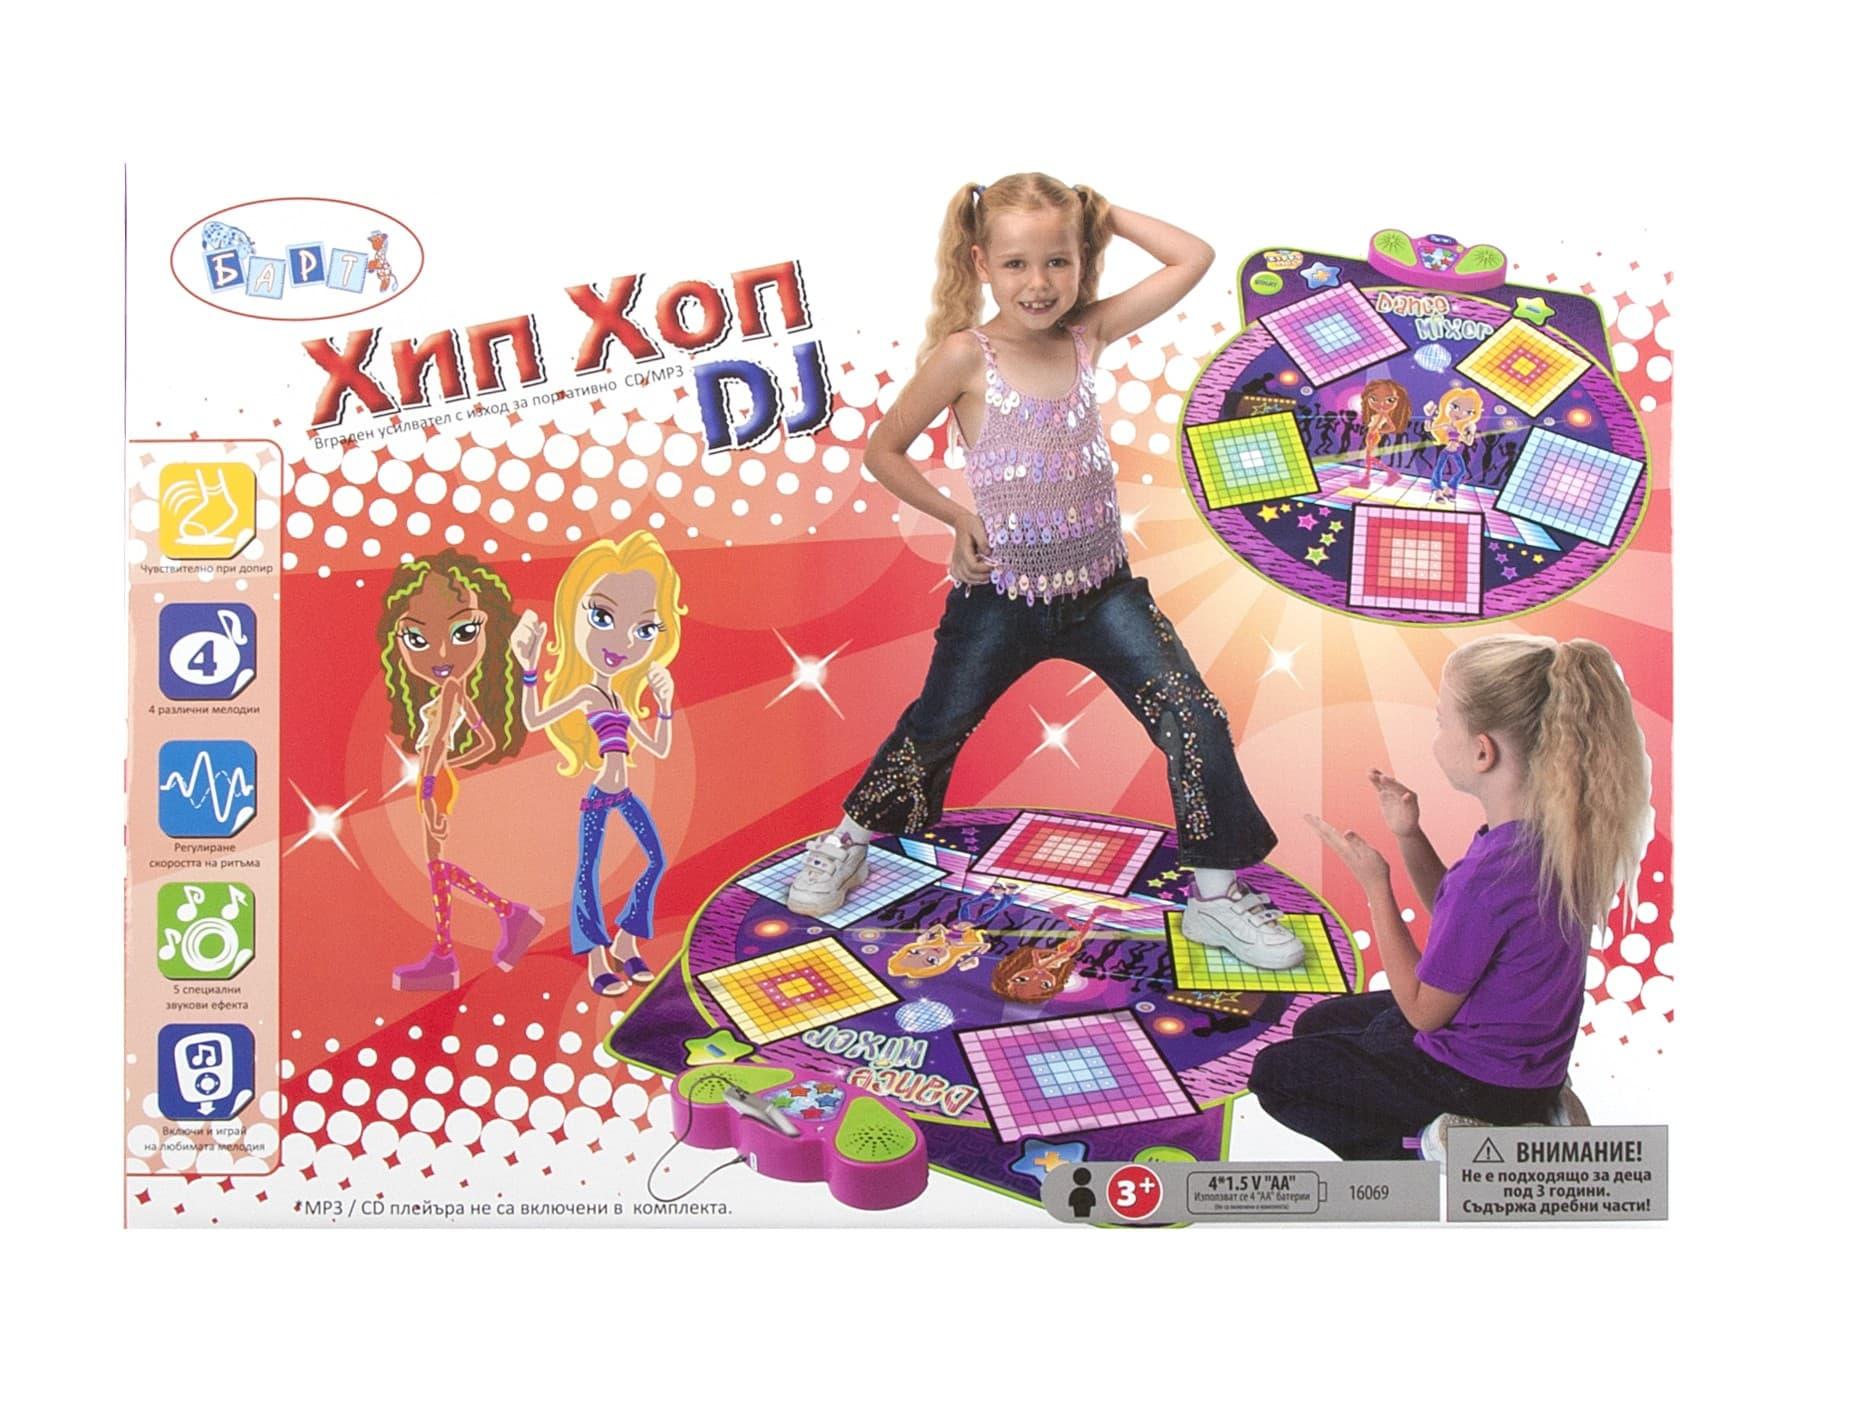 Барт-Музикално килимче Dance mixer